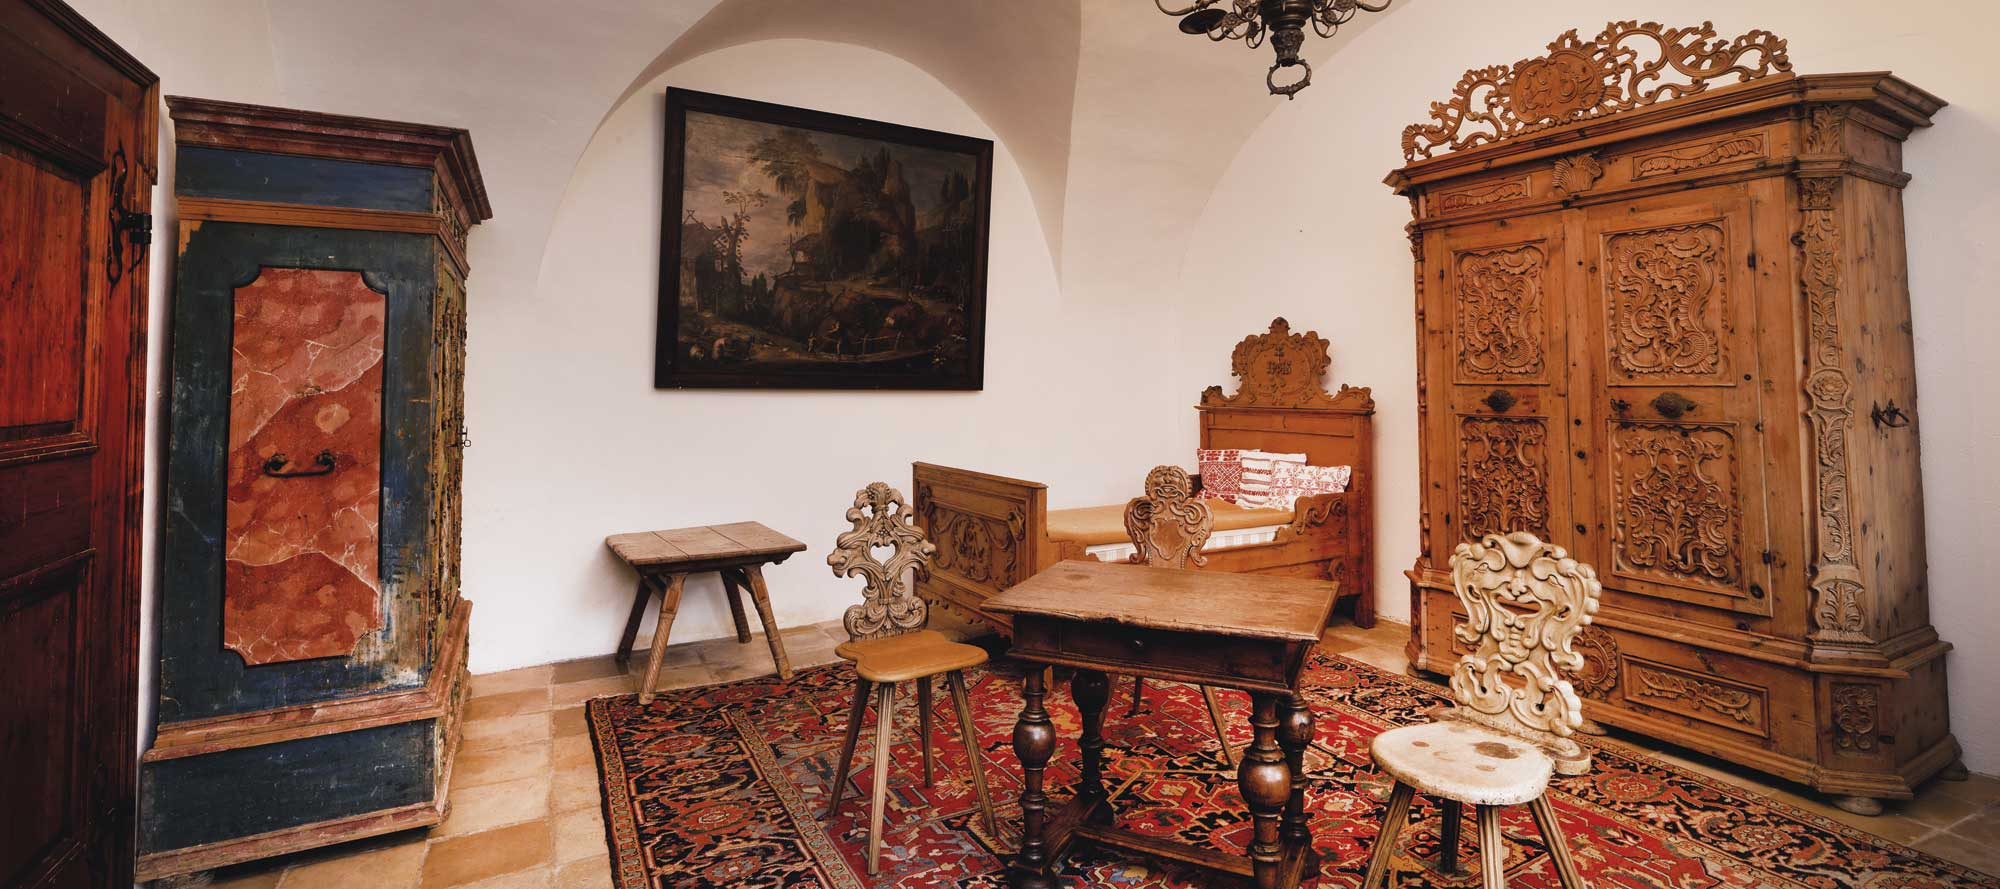 Schloss Schwallenbach, Thematischer Innenraum, Sammlung Reinhold Hofstätter, Dorotheum Auktion am 12.09.2016